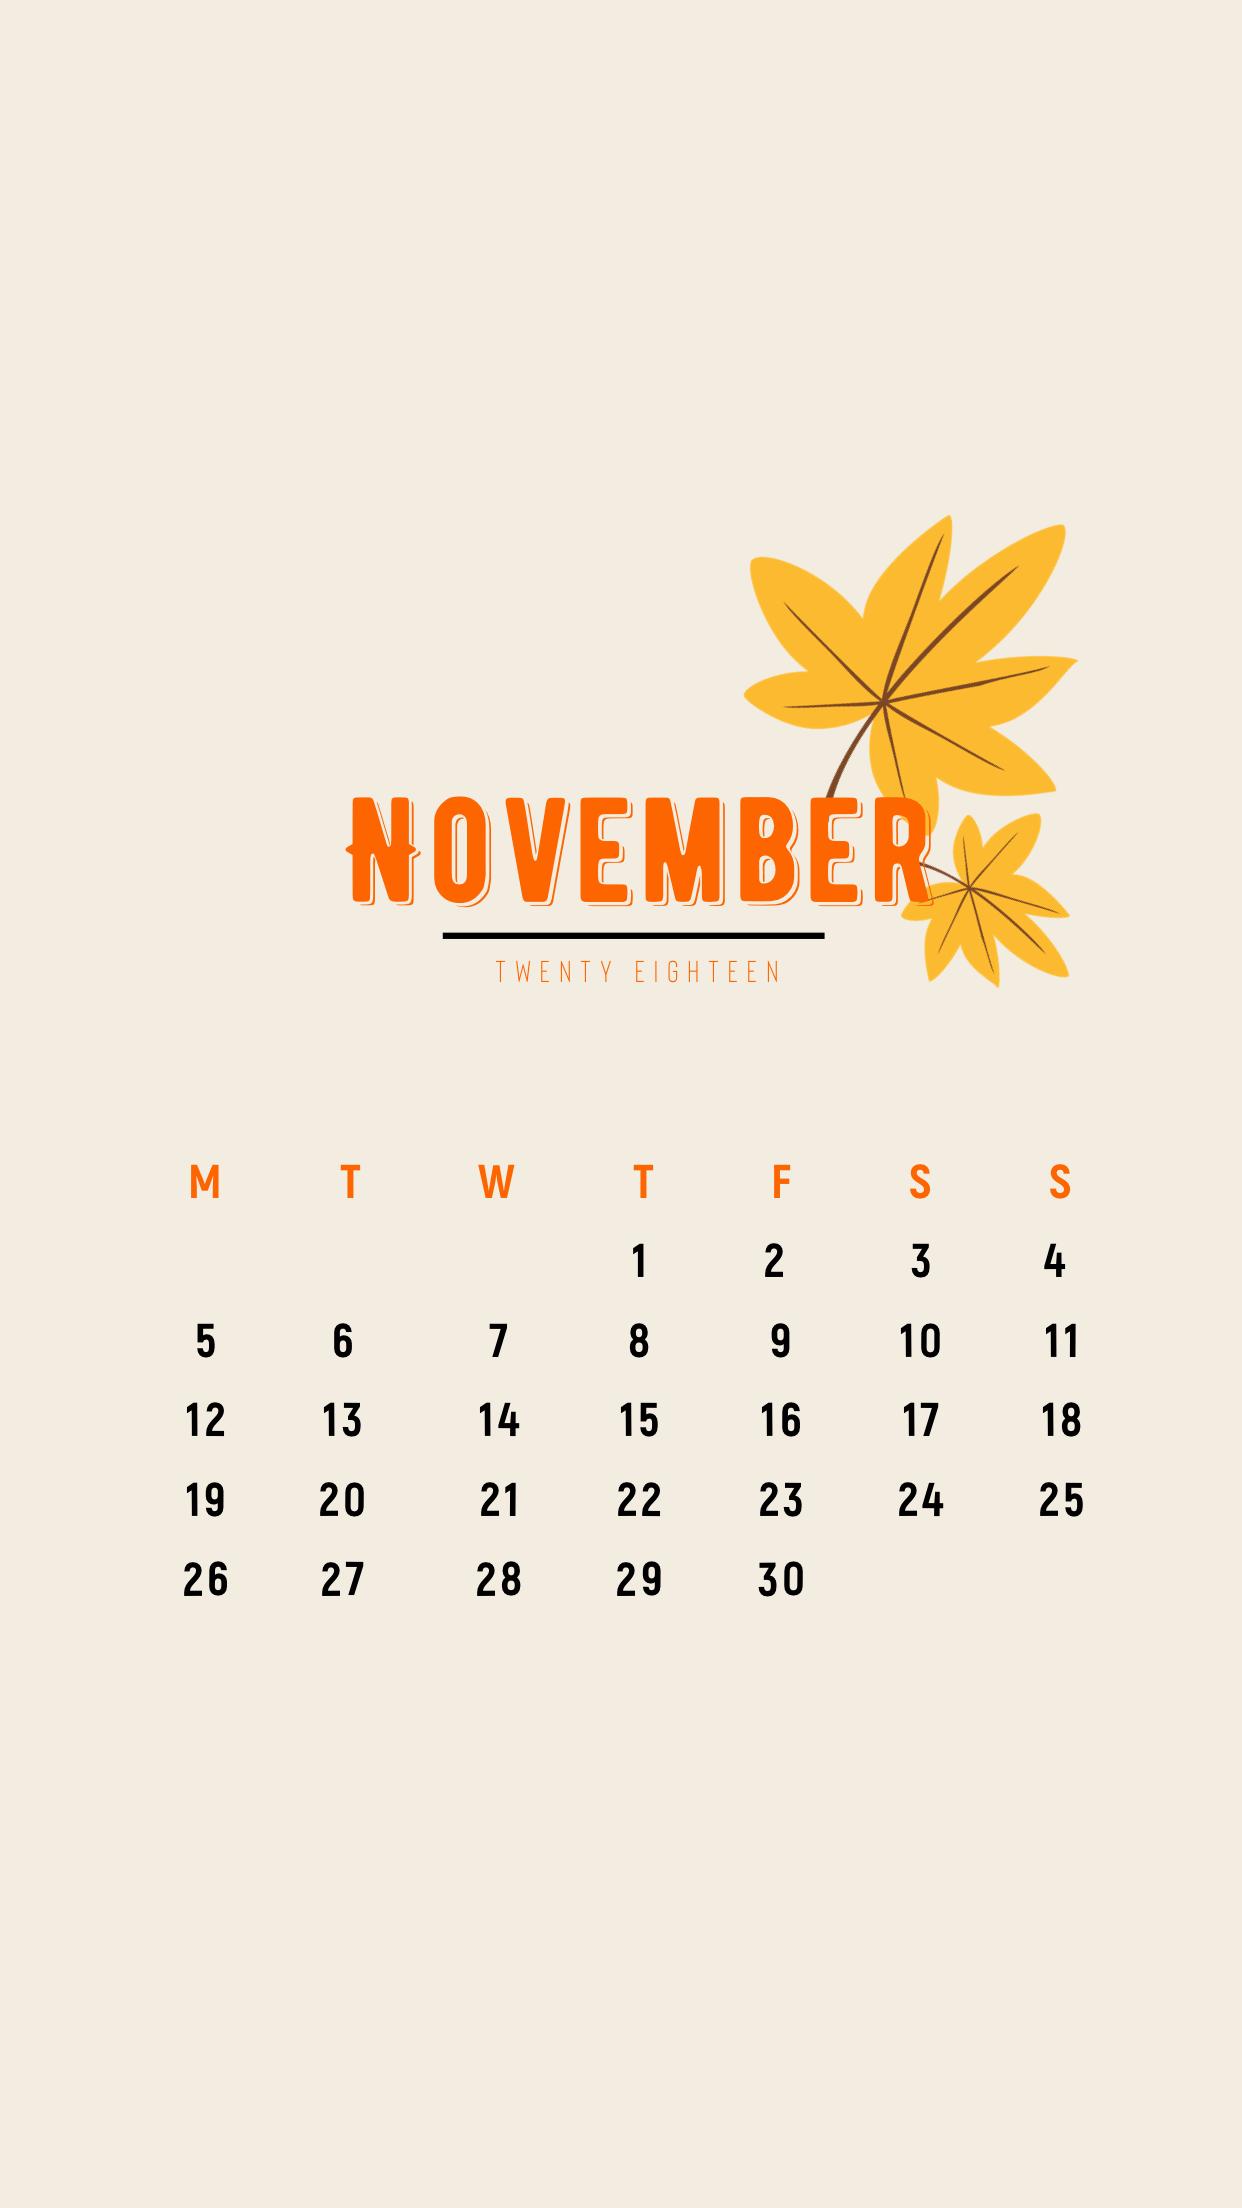 minimal November 2018 calendar wallpaper iPhone (maple